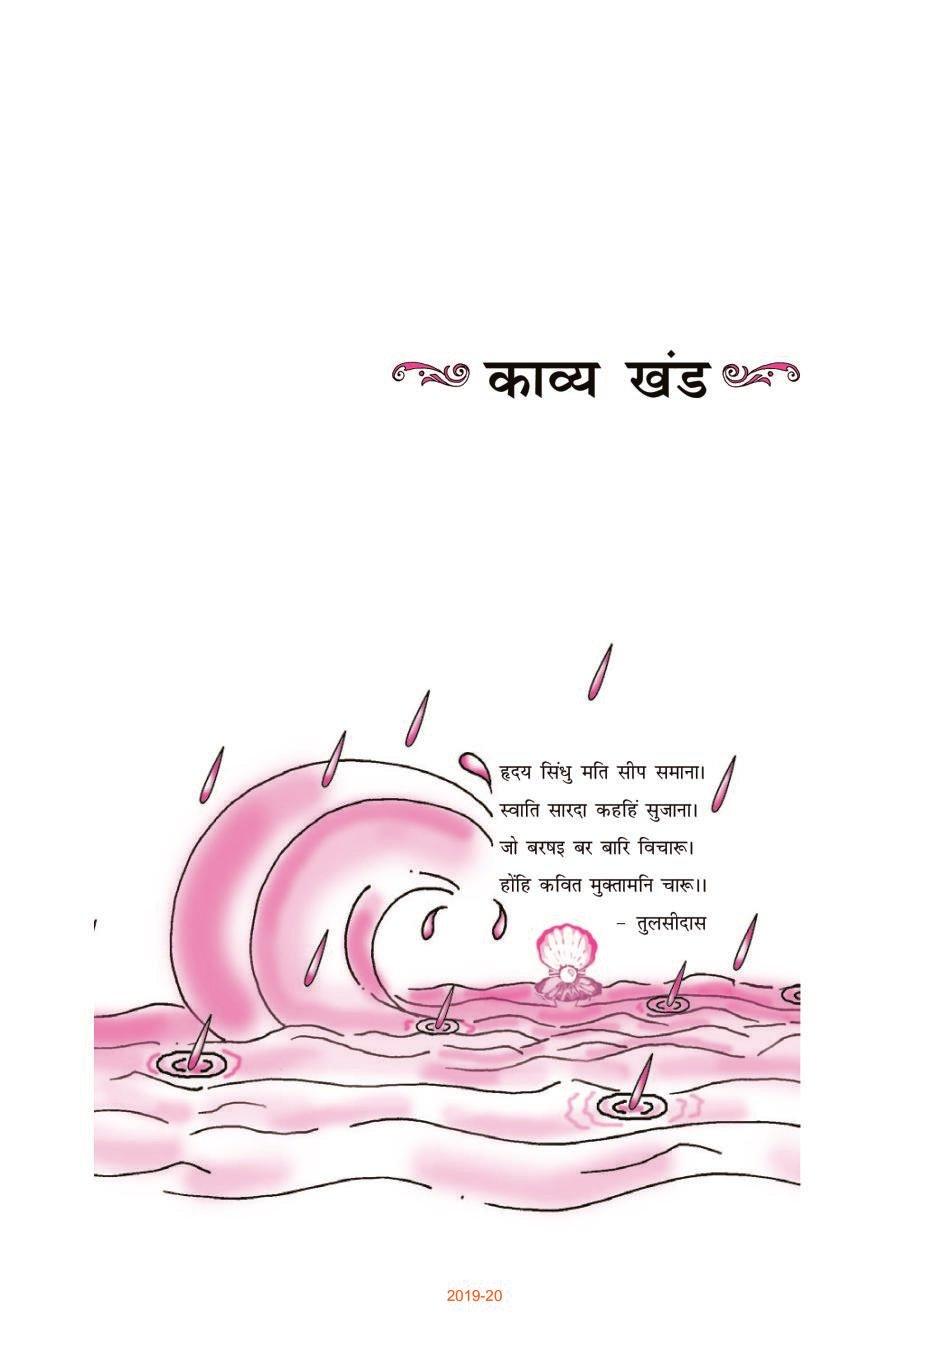 NCERT Book Class 10 Hindi (क्षितिज) Chapter 1 सूरदास - Page 1